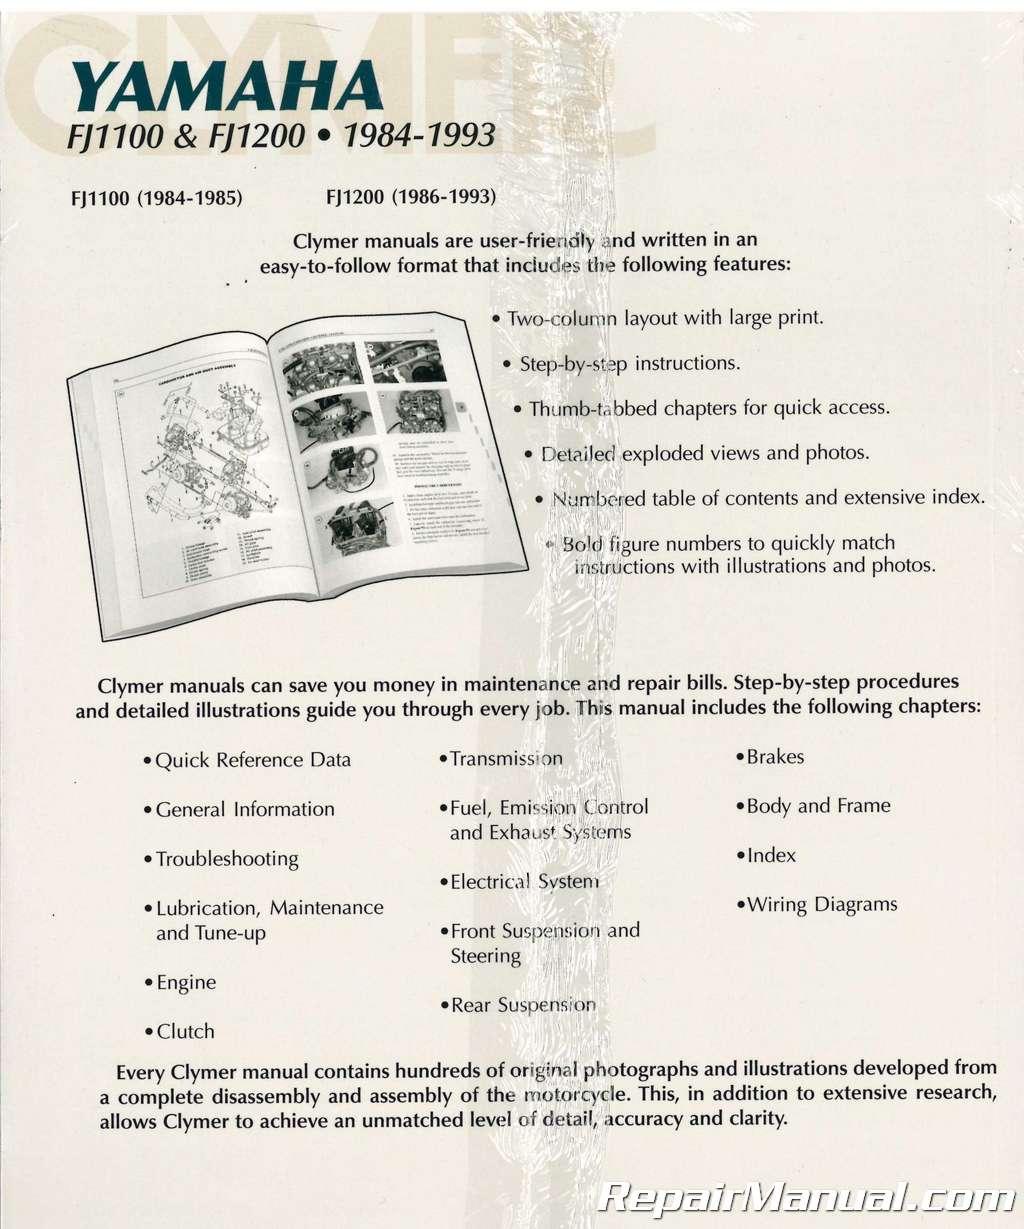 Clymer Yamaha Fj1100 Fj1200 1984 1993 Motorcycle Repair Manual